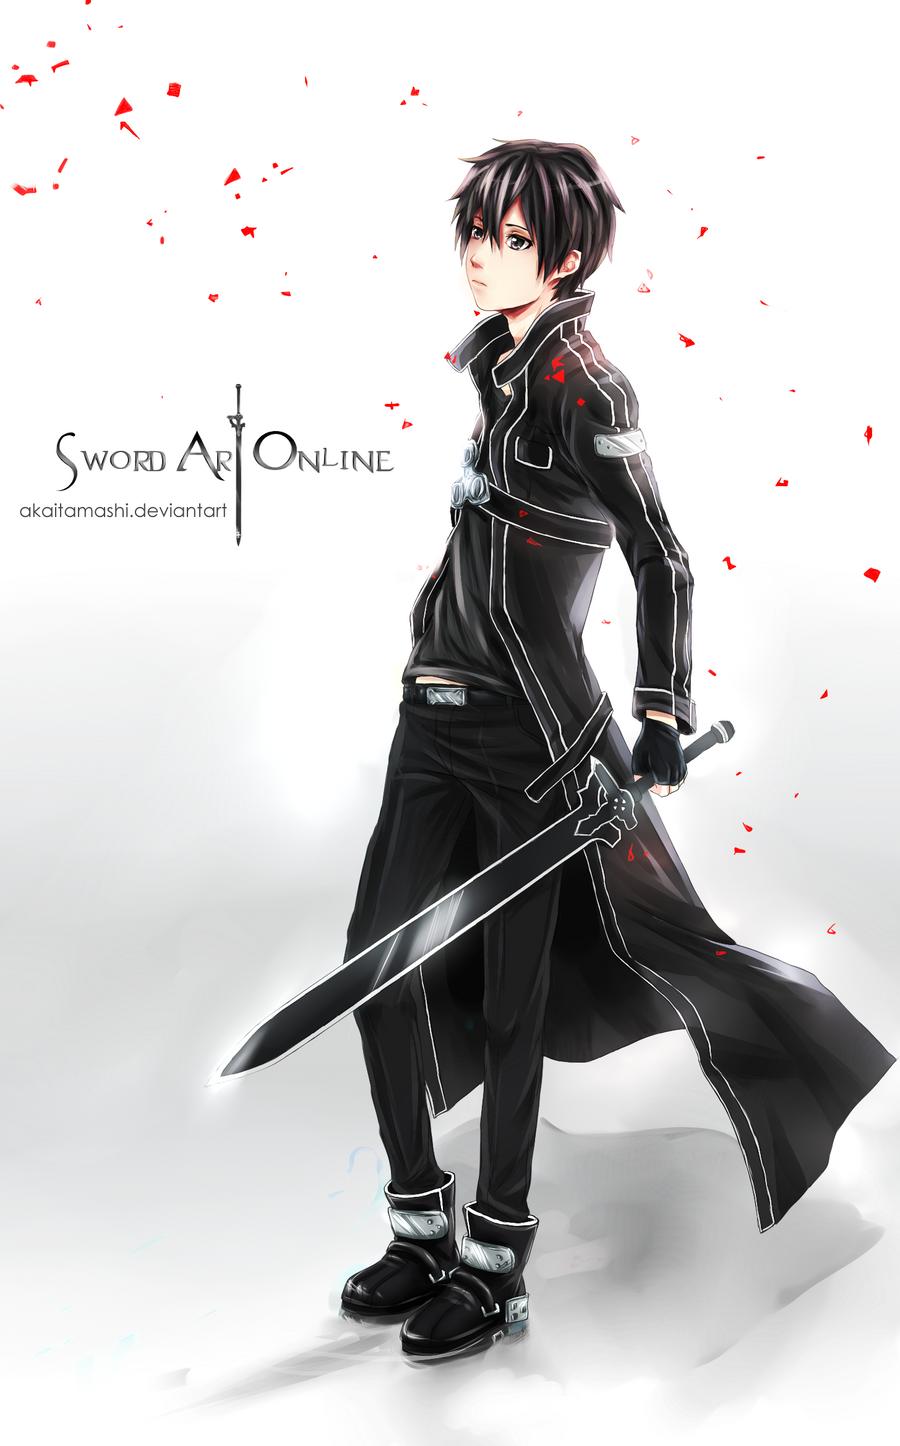 Sword art online kirito by akaitamashi fan art manga anime digital